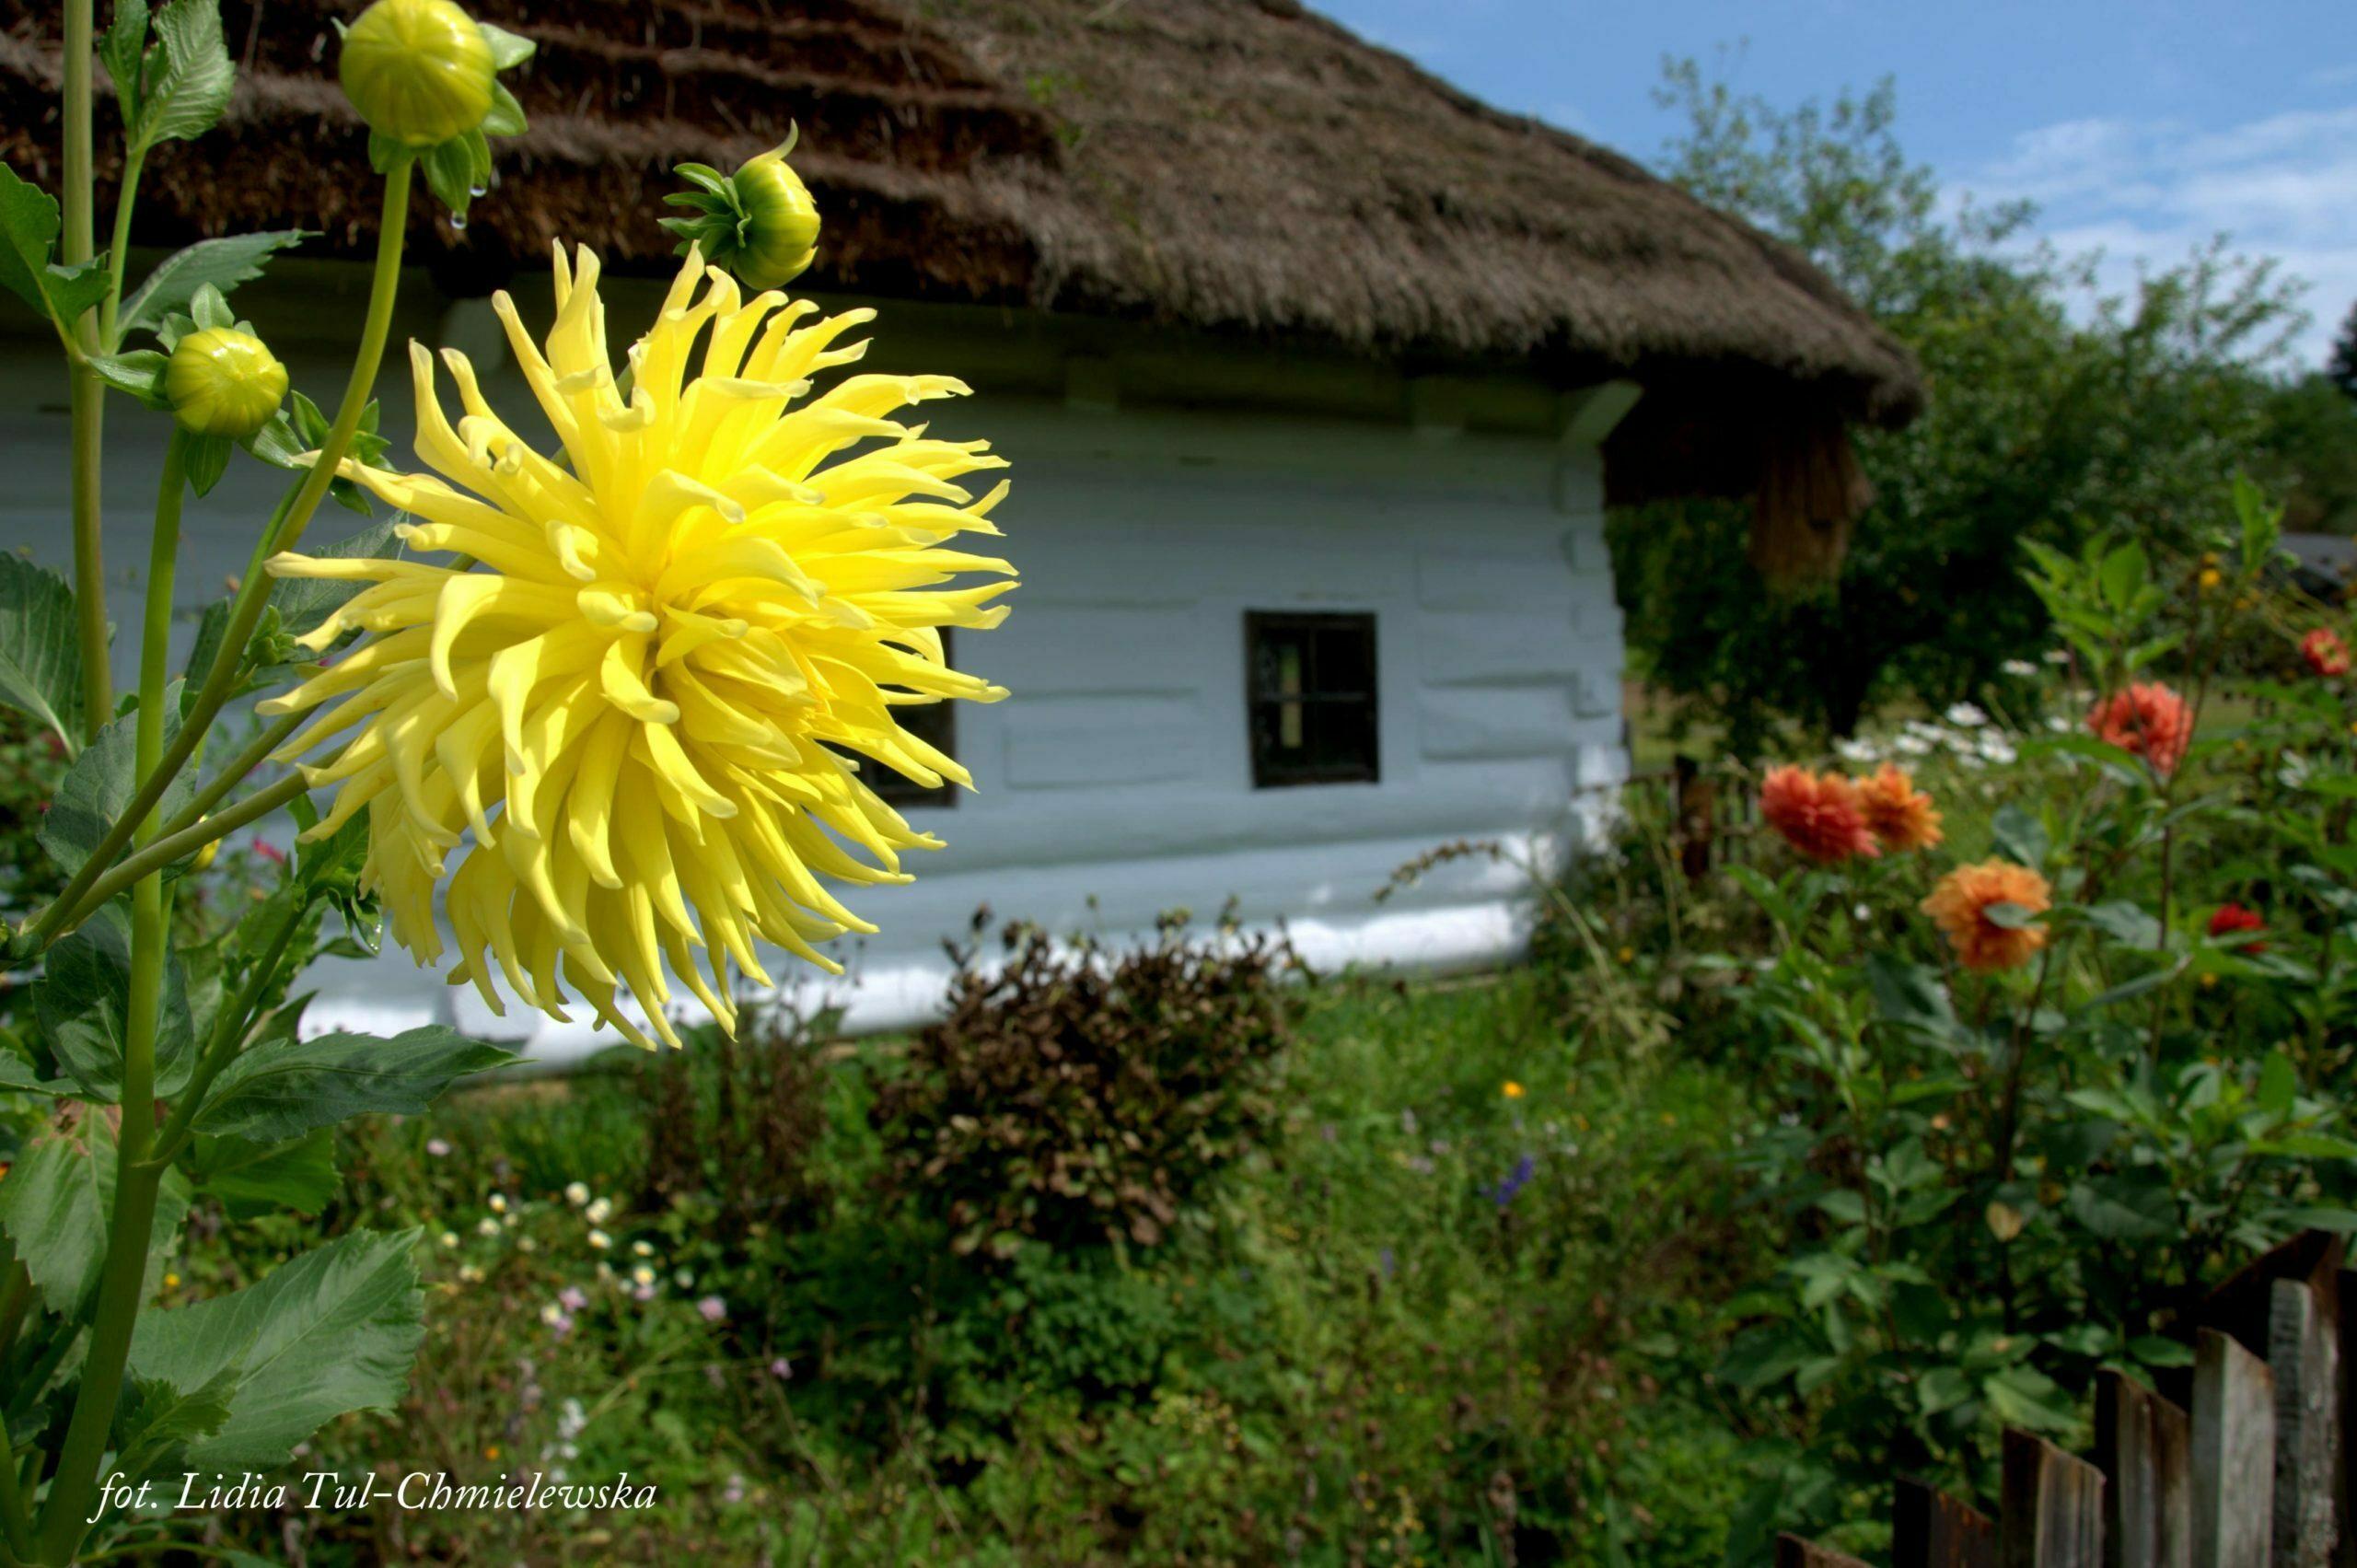 Chata i kwiat/ fot. Lidia Tul-Chmielewska